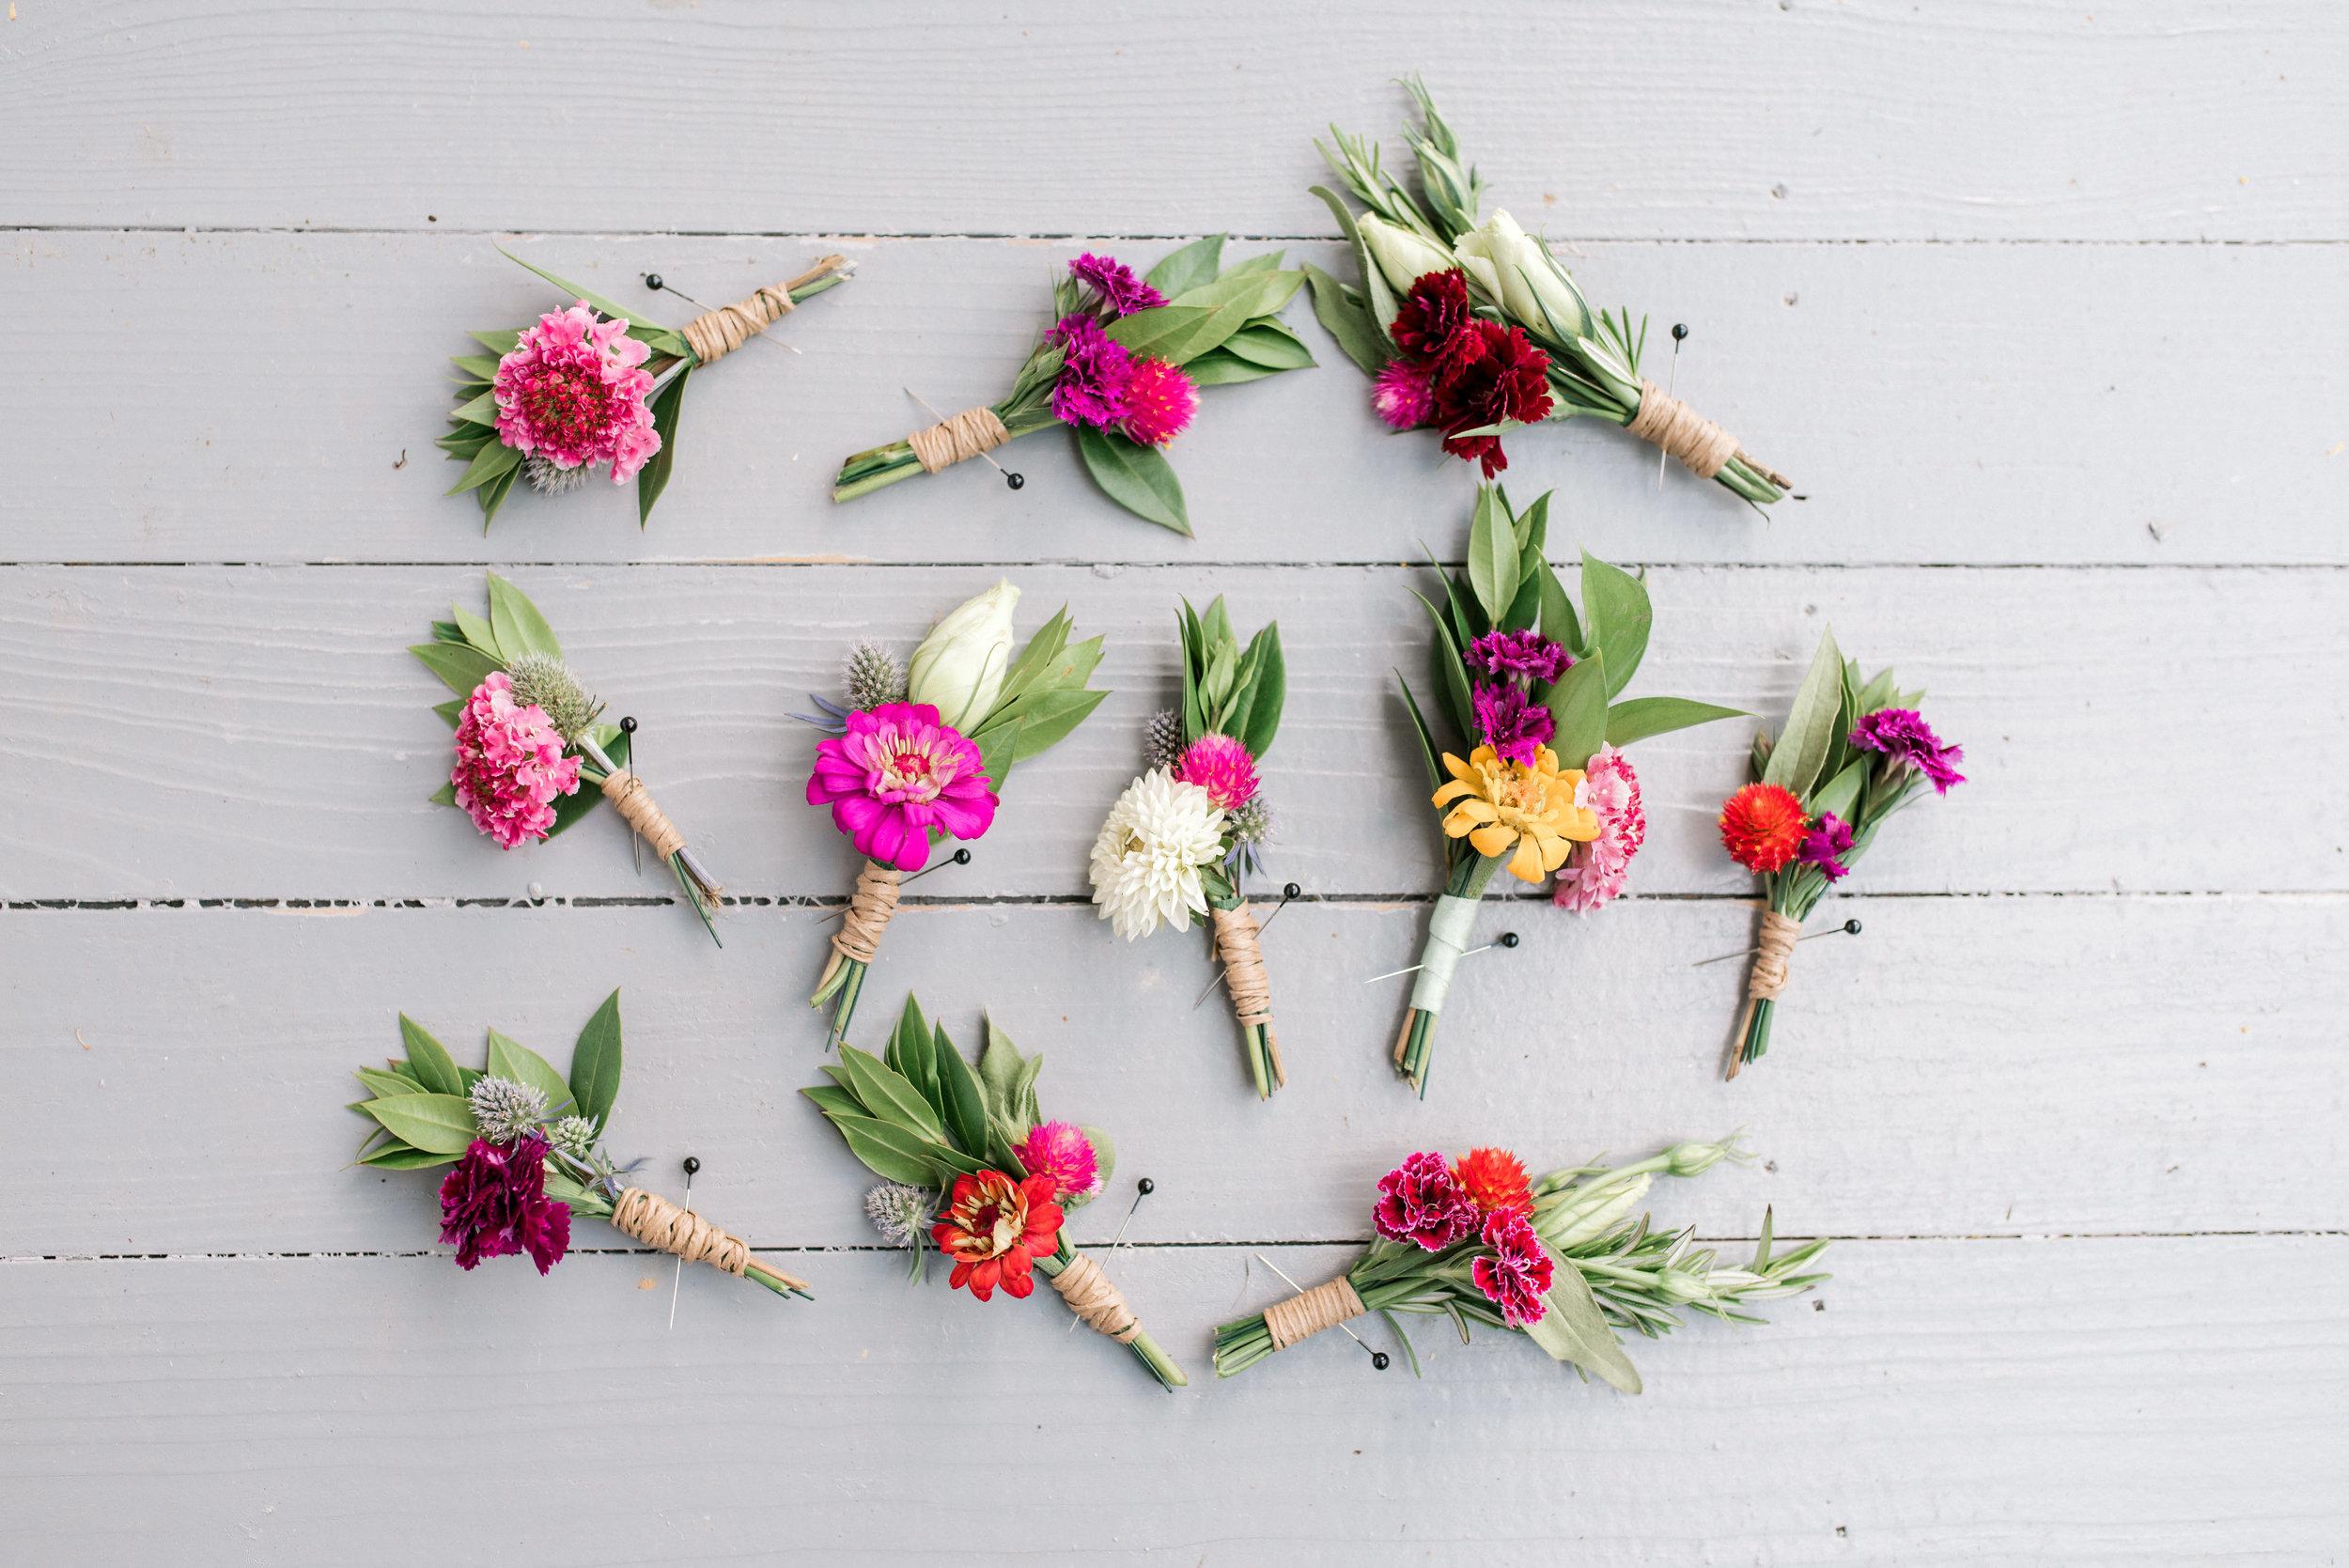 asbury-meadow-bed-and-breakfast-wedding-photographer